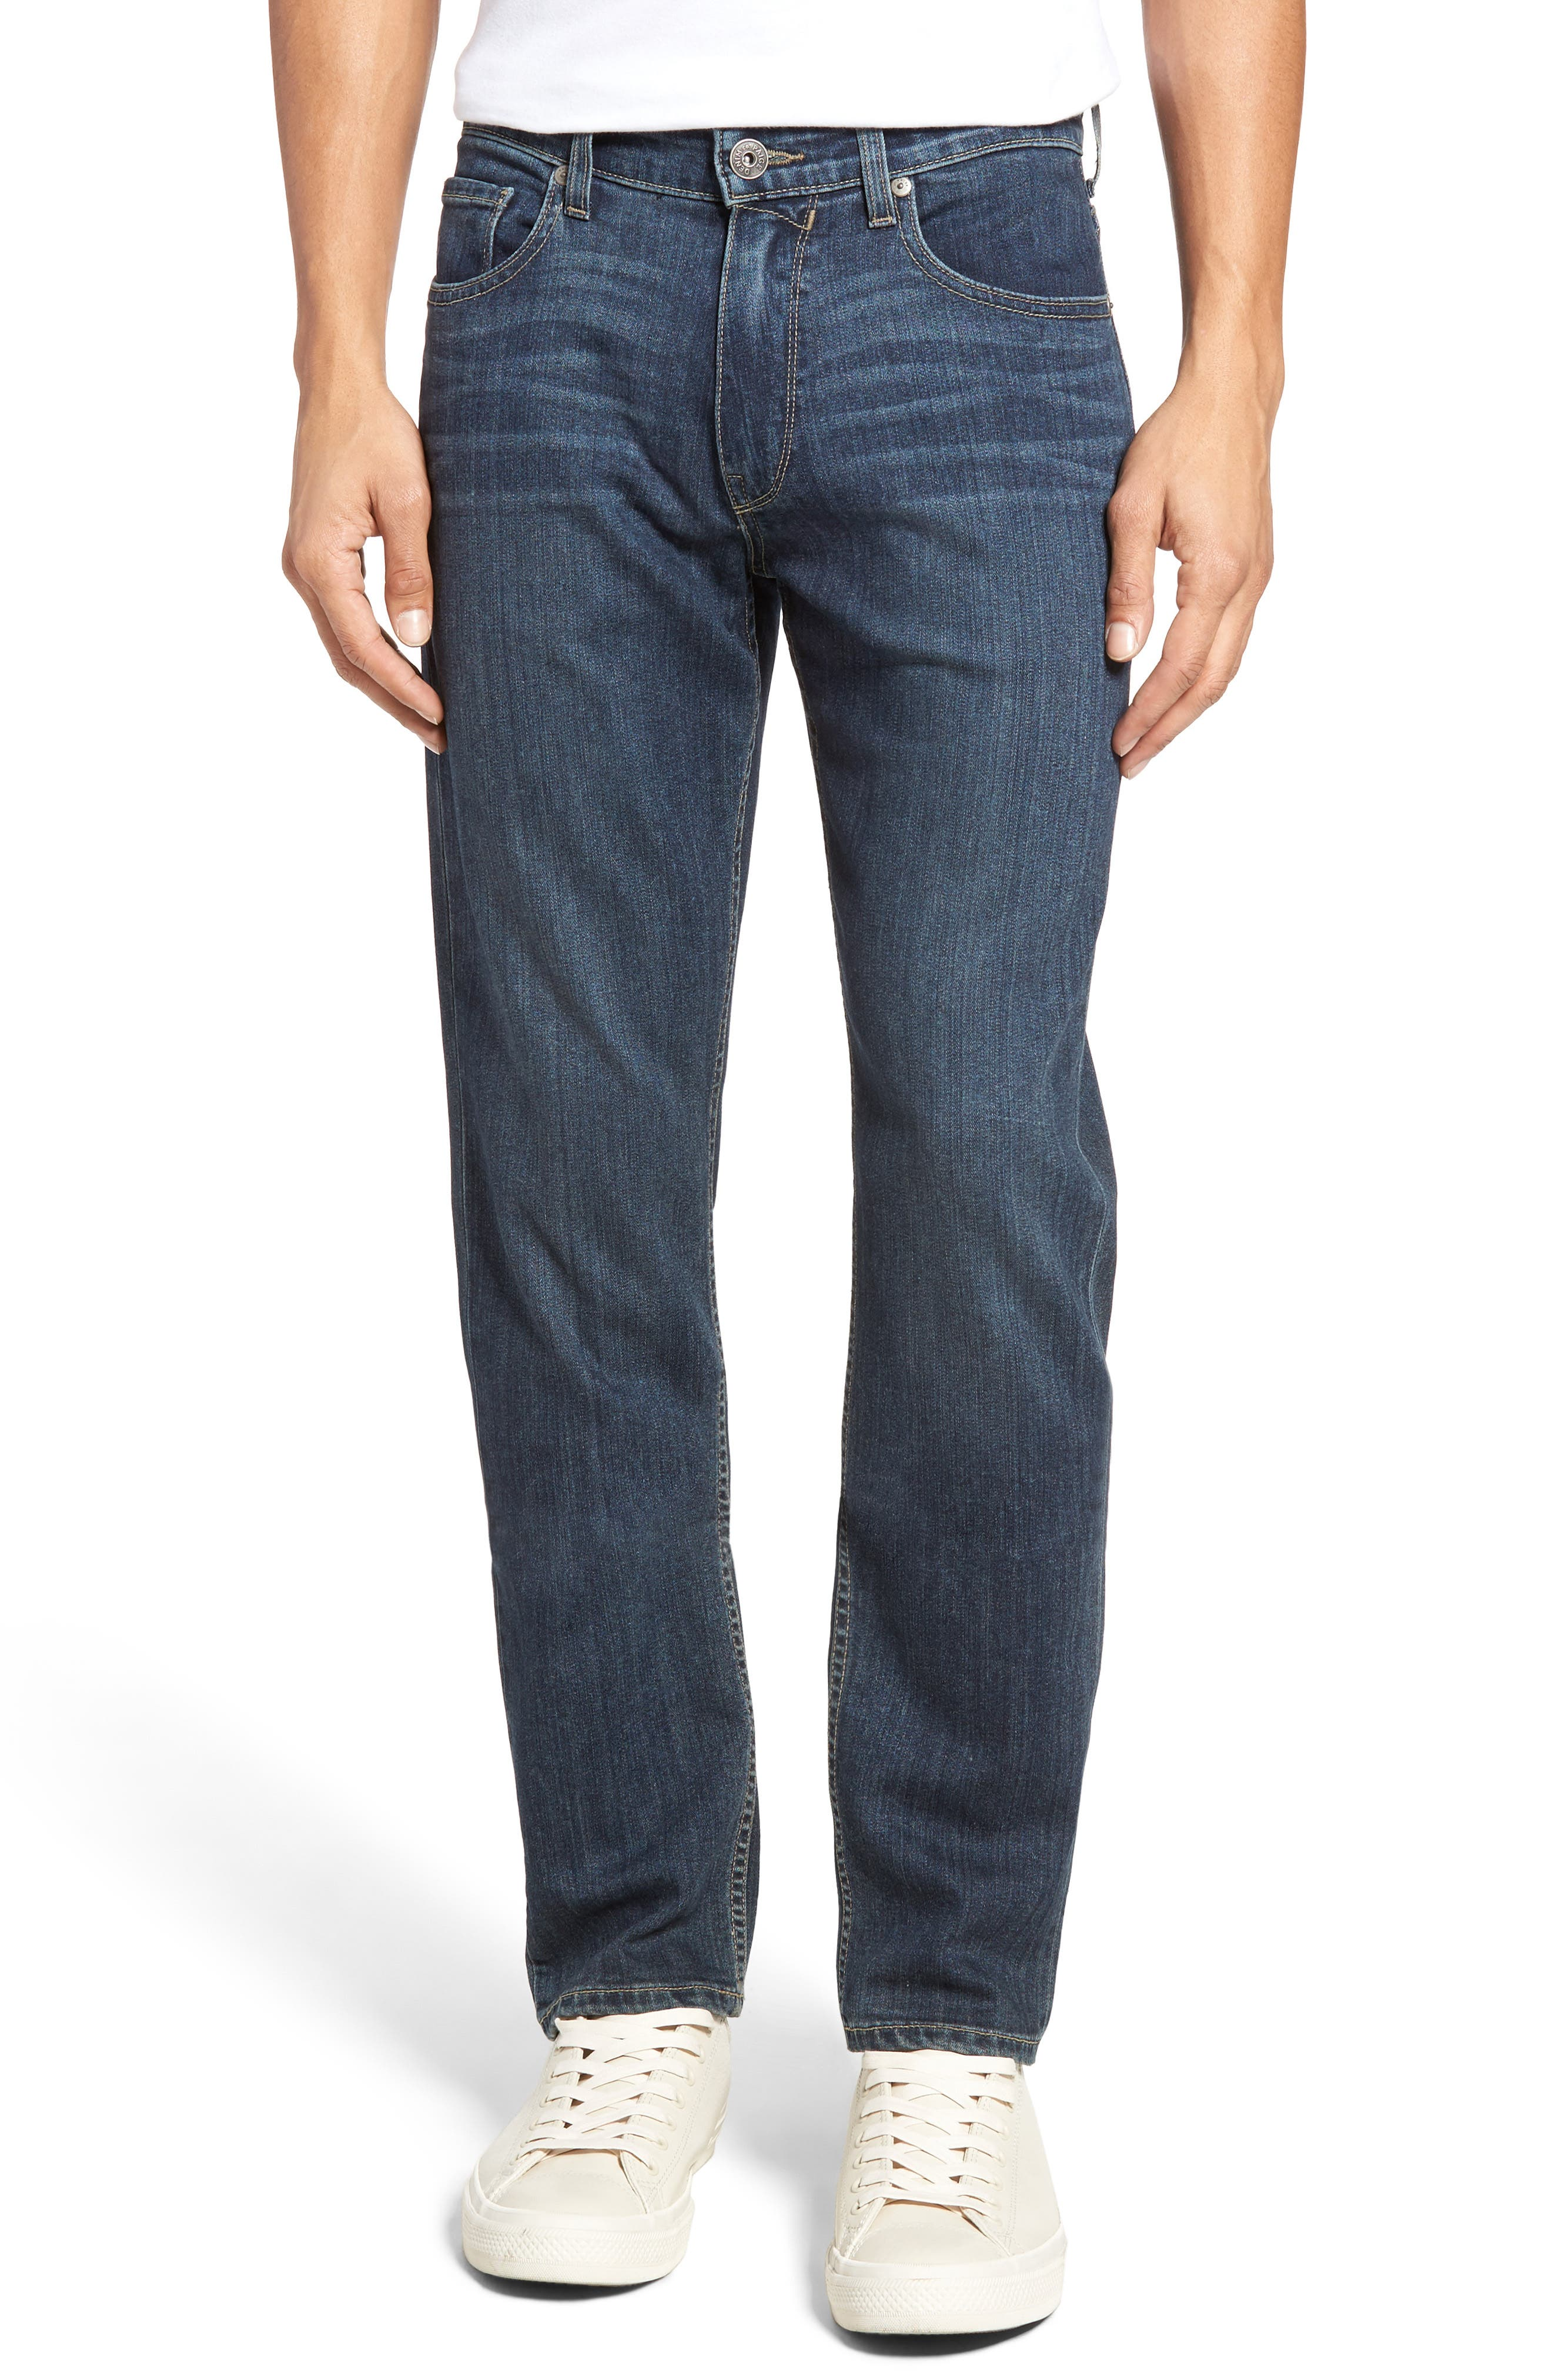 Transcend - Federal Slim Straight Leg Jeans,                         Main,                         color, WAYNE